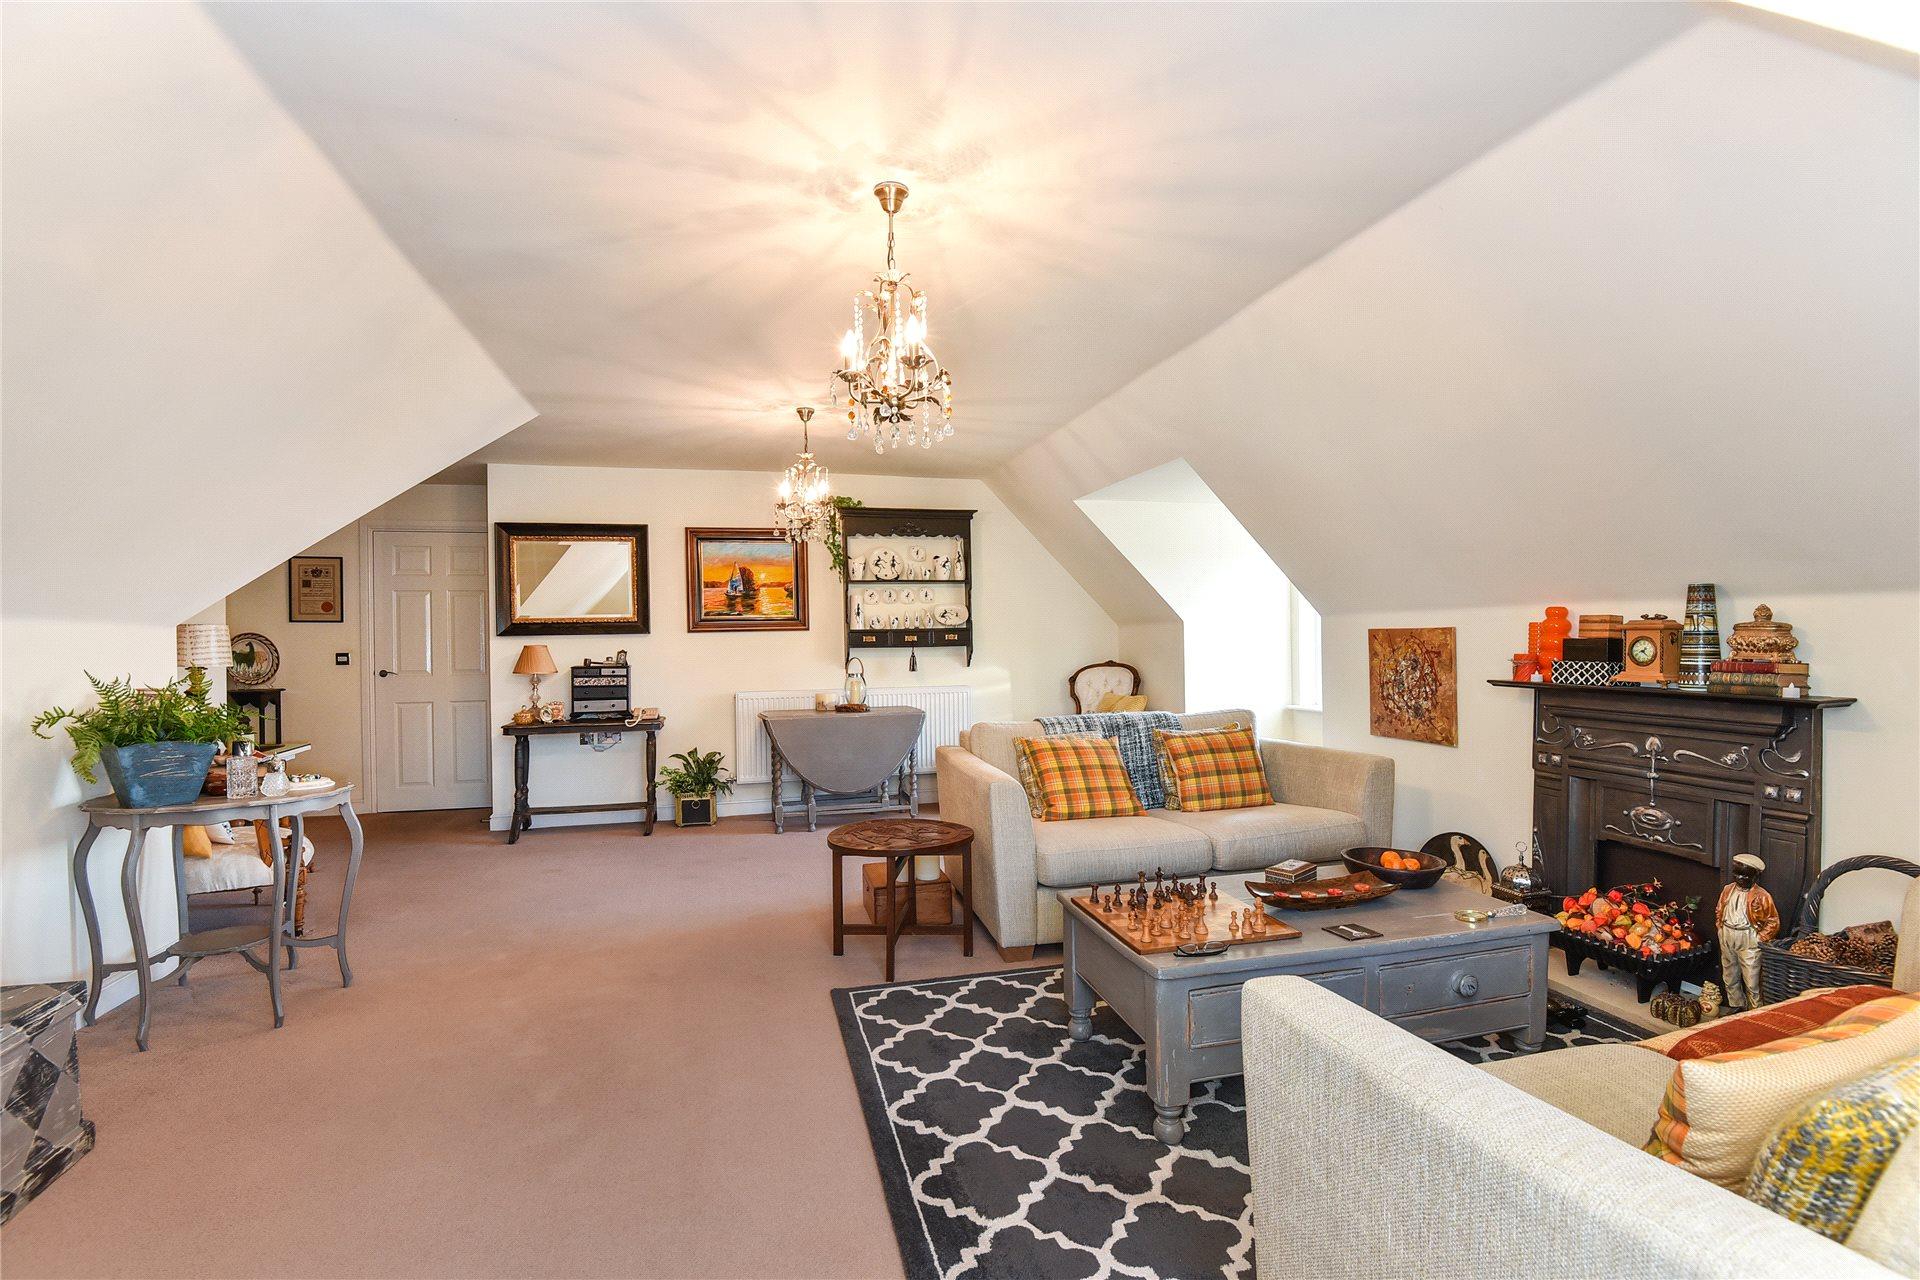 2 Bedrooms Apartment Flat for sale in St. Sebastians Court, Nine Mile Ride, Wokingham, Berkshire, RG40